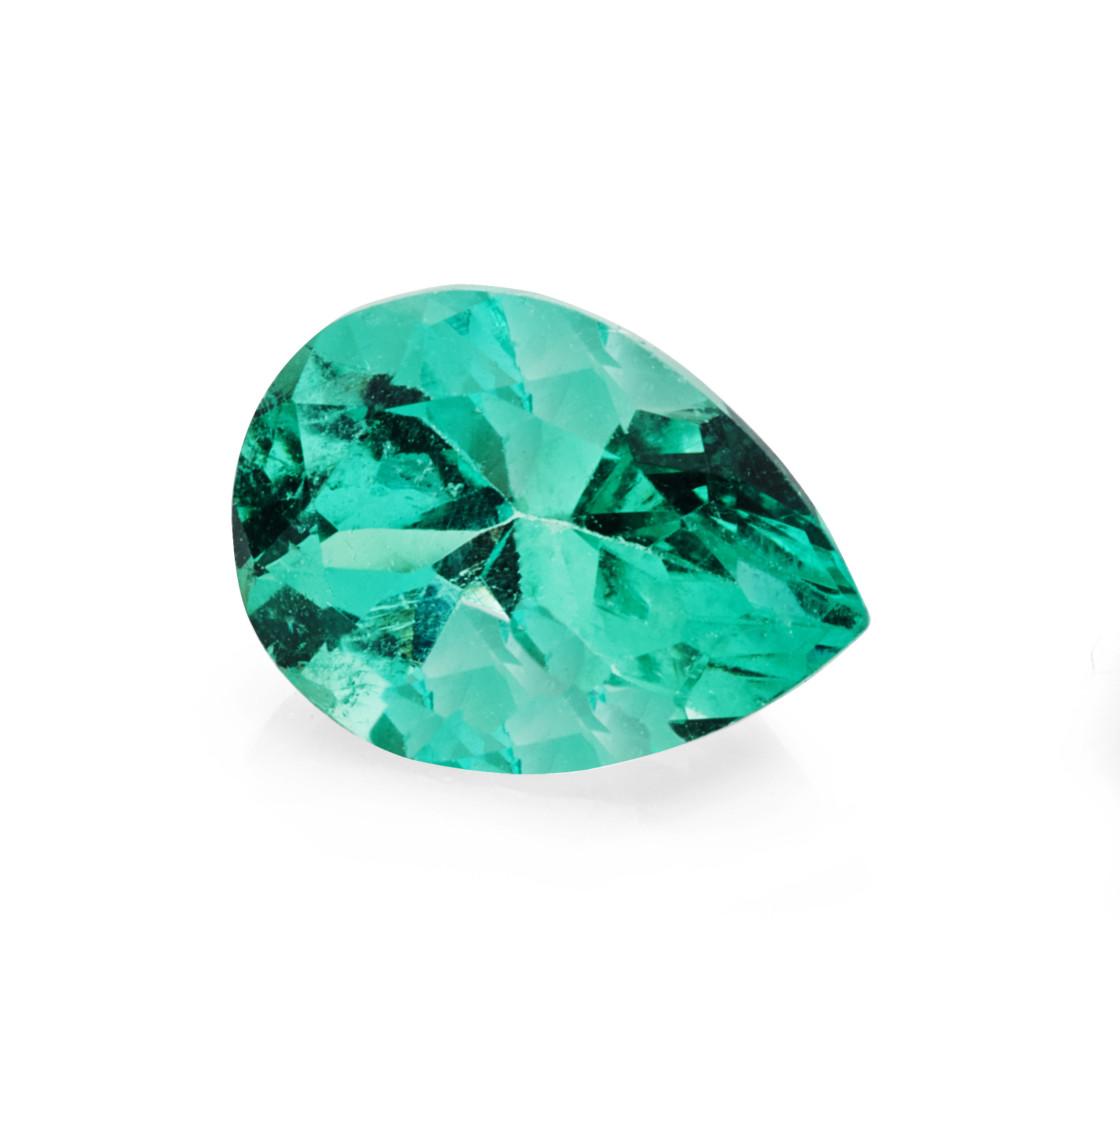 """1.23 carat, pear shape cut green emerald gemstone"" stock image"